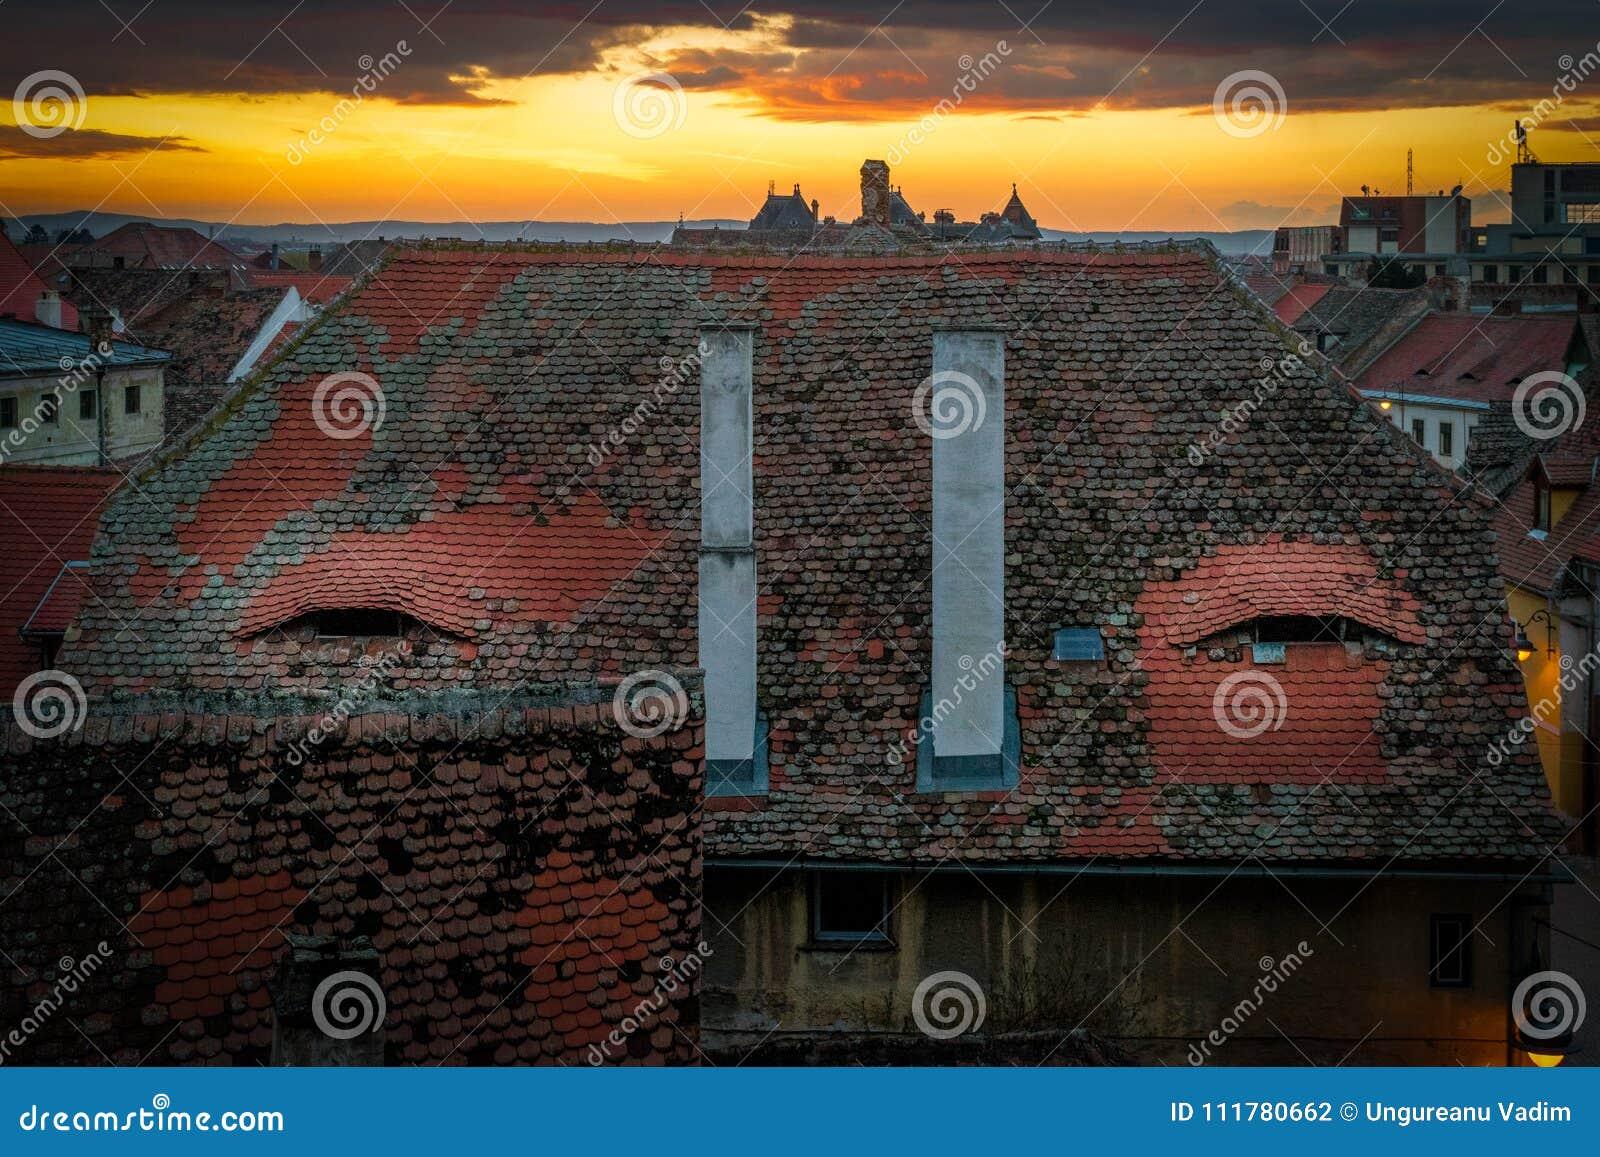 Sibiu, Romania. The city where houses have eyes